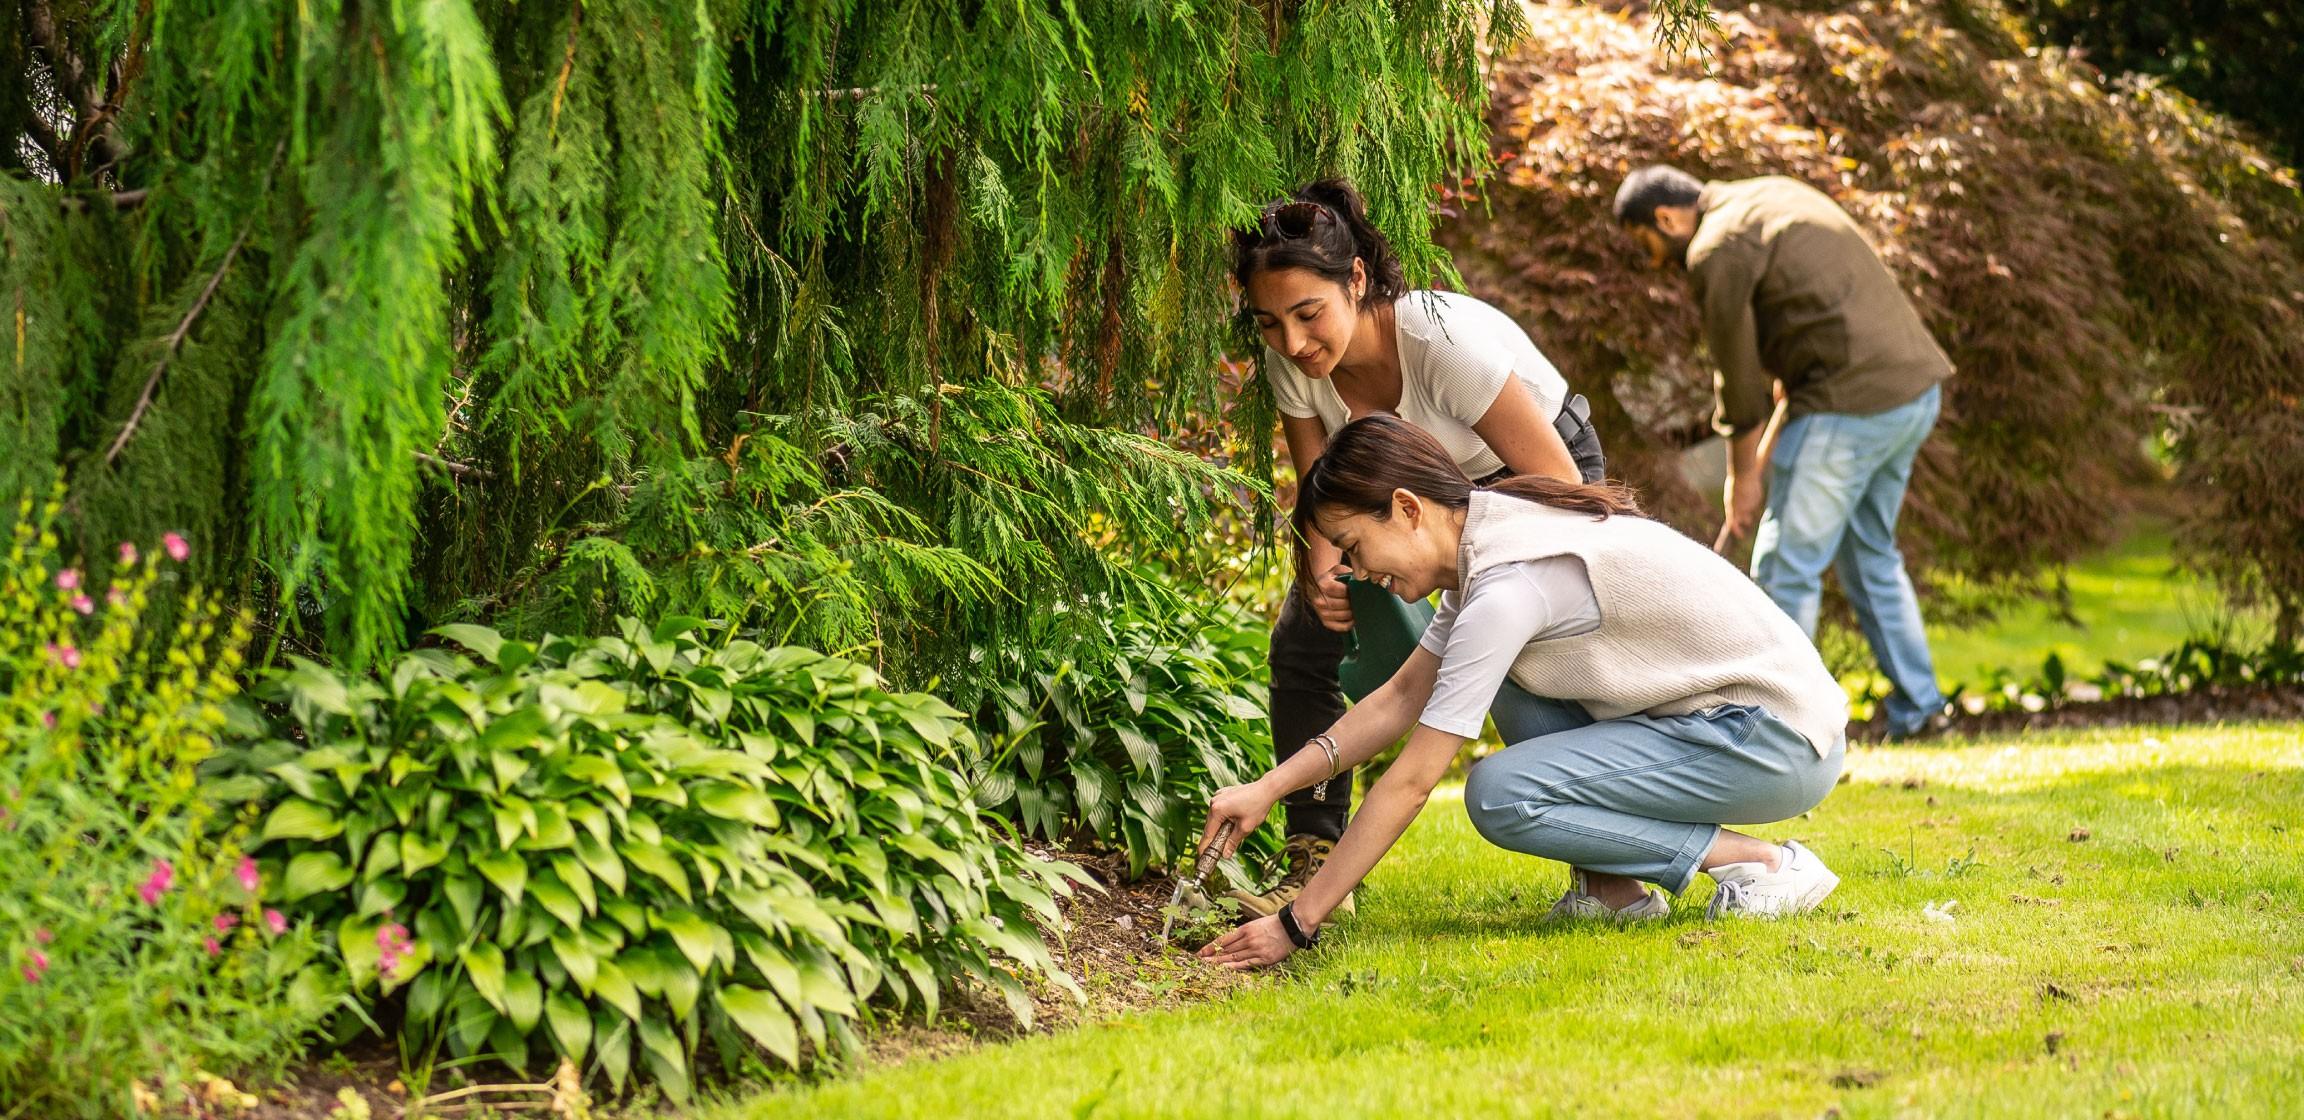 Three people tend to a community garden in their neighbourhood